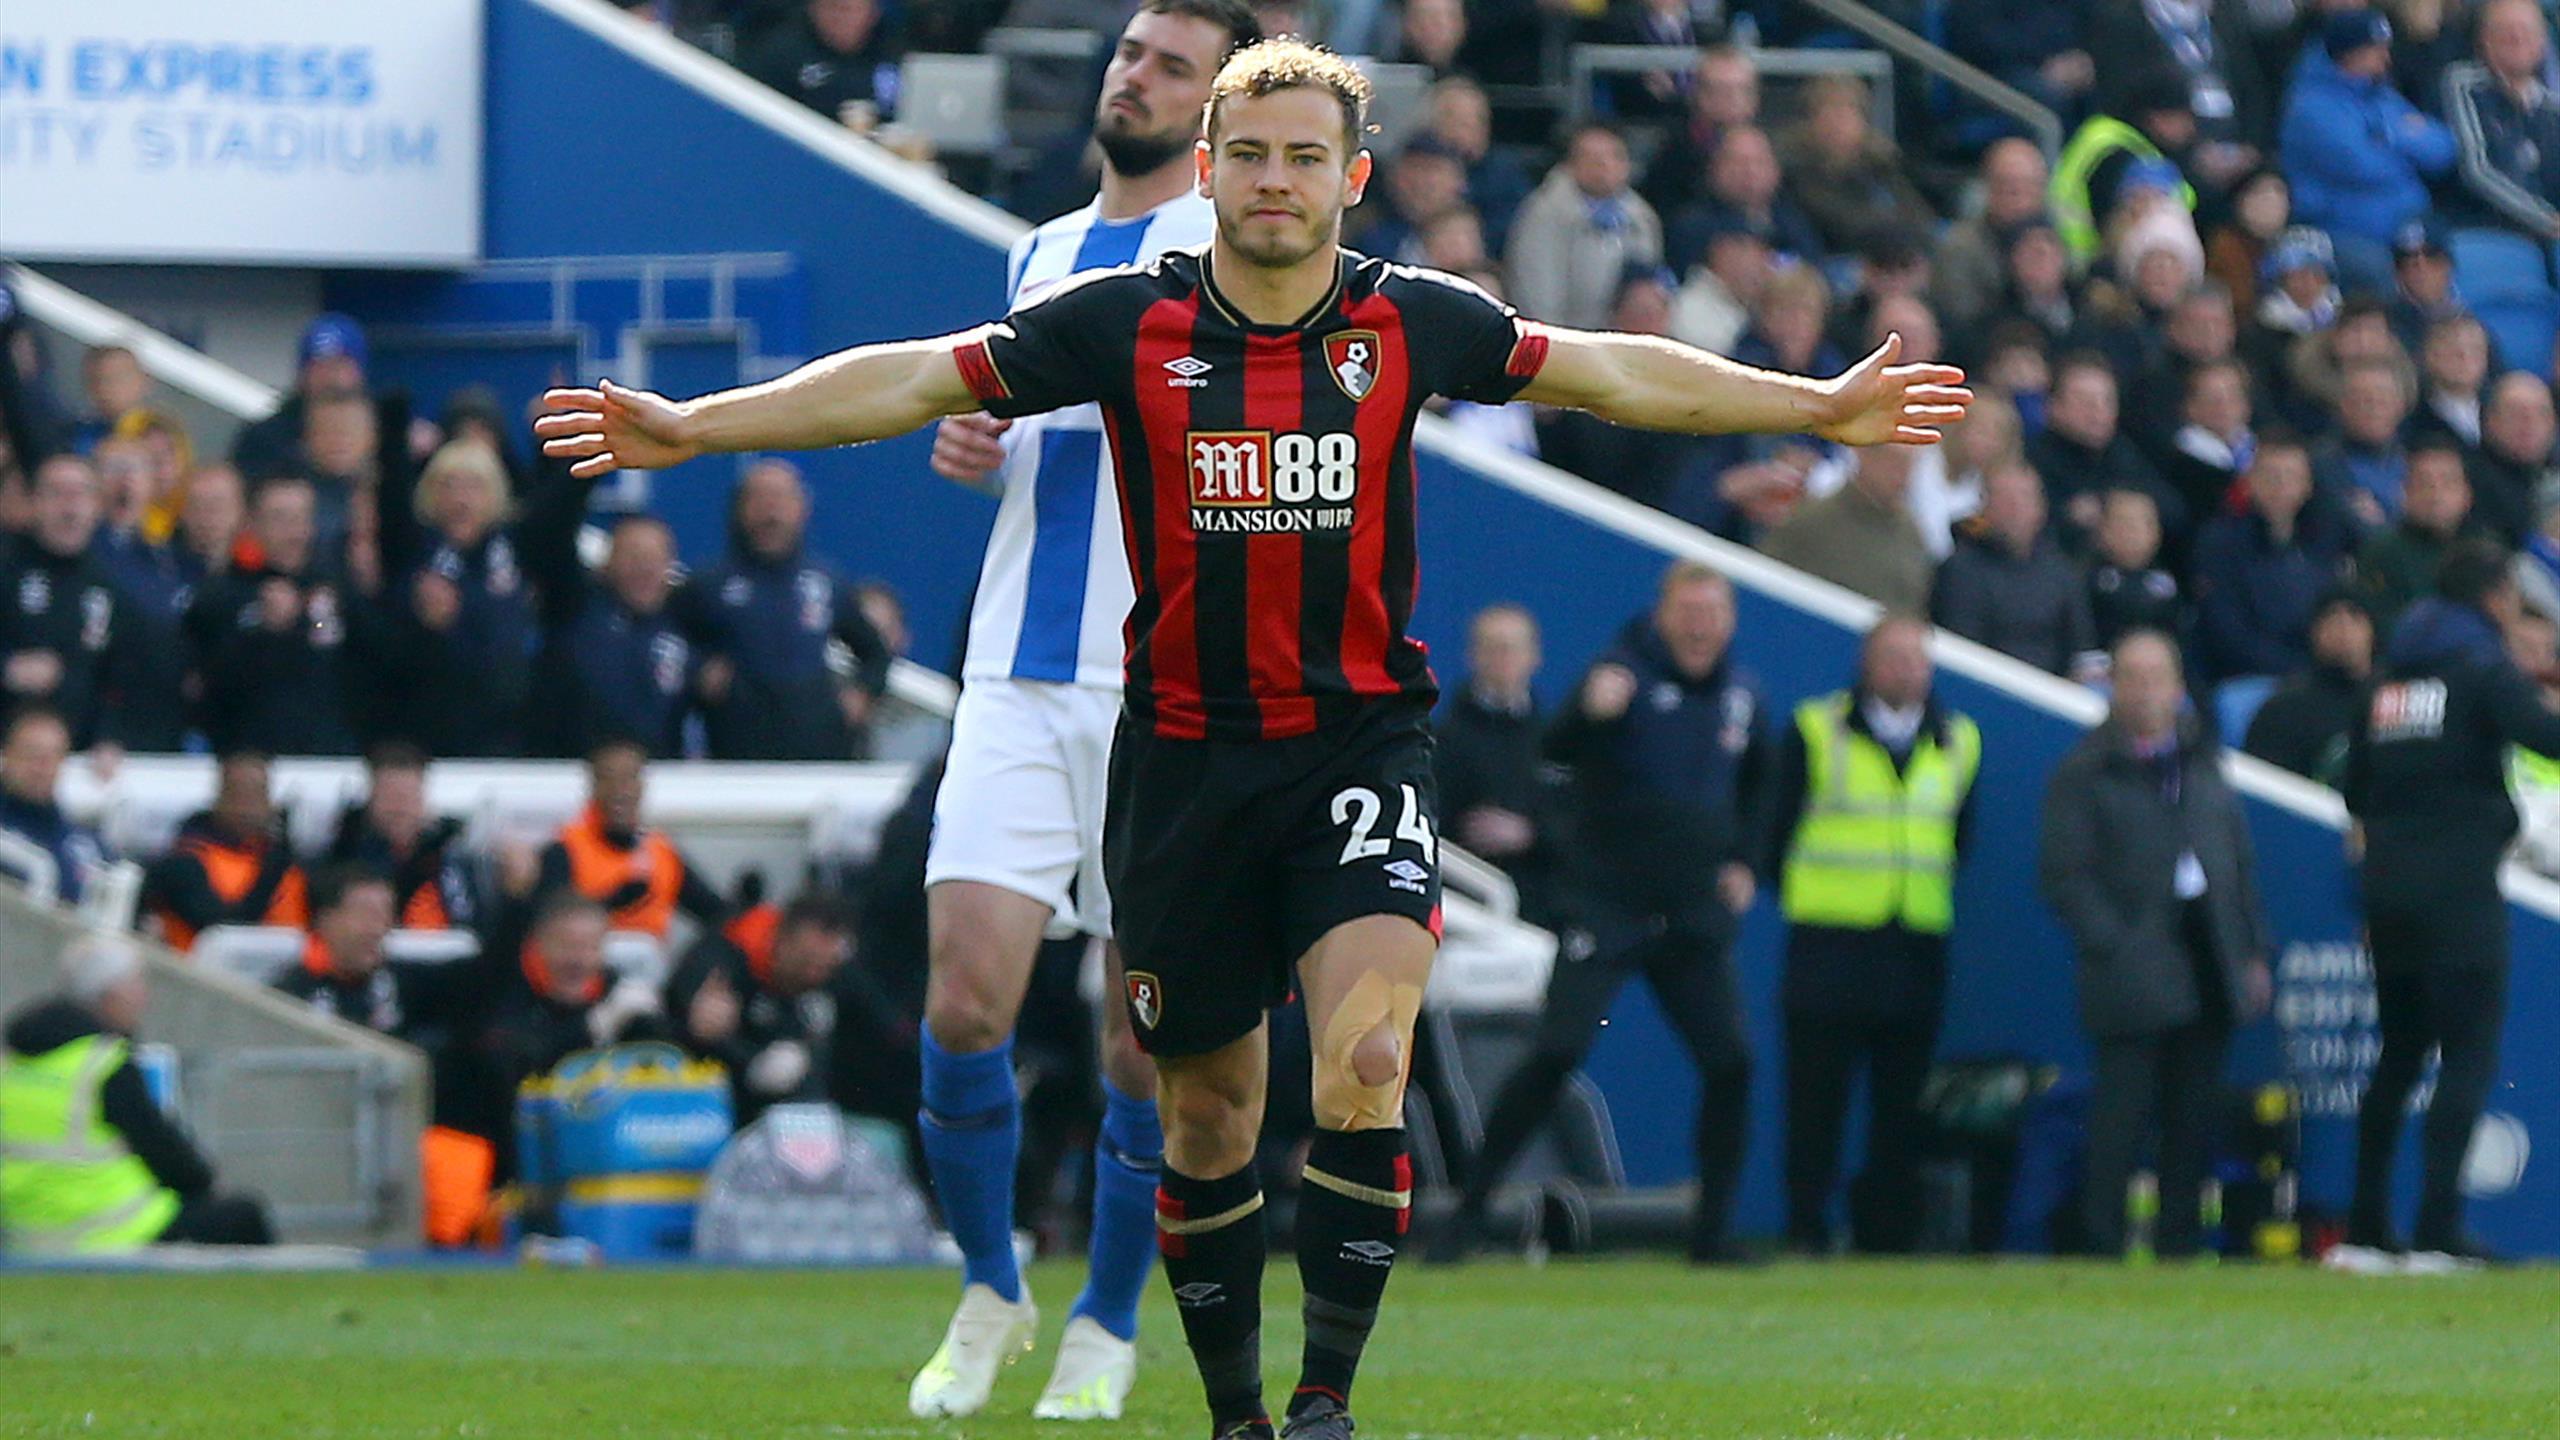 Deadline Day As It Happened Transfers 2019 2020 Football